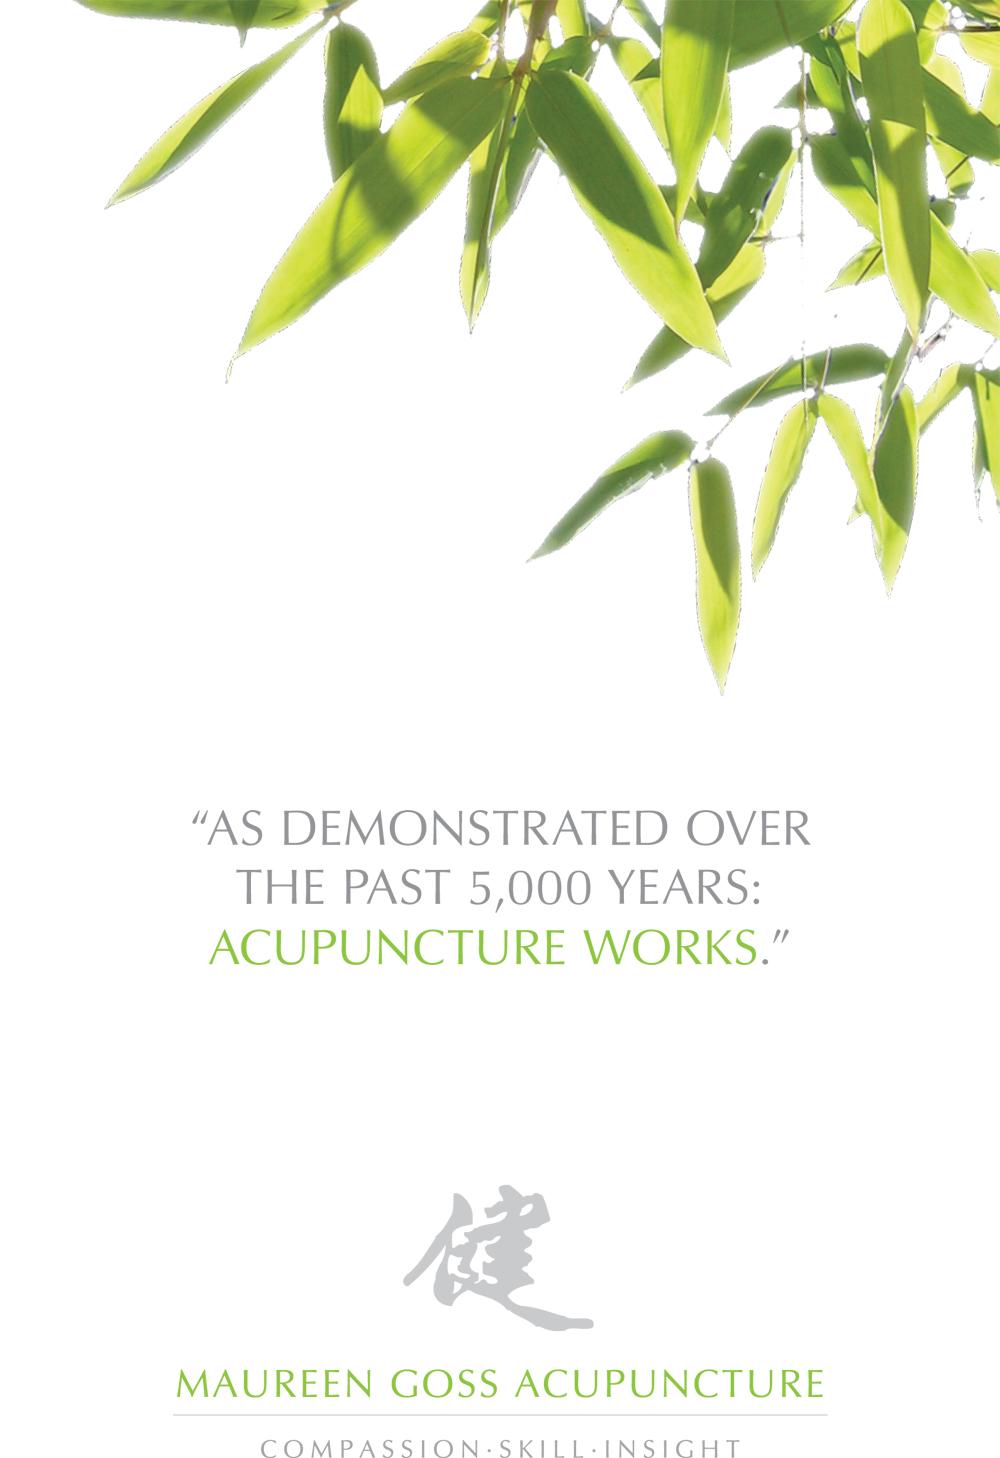 Maureen Goss Acupuncture, brochure, Tronvig Group